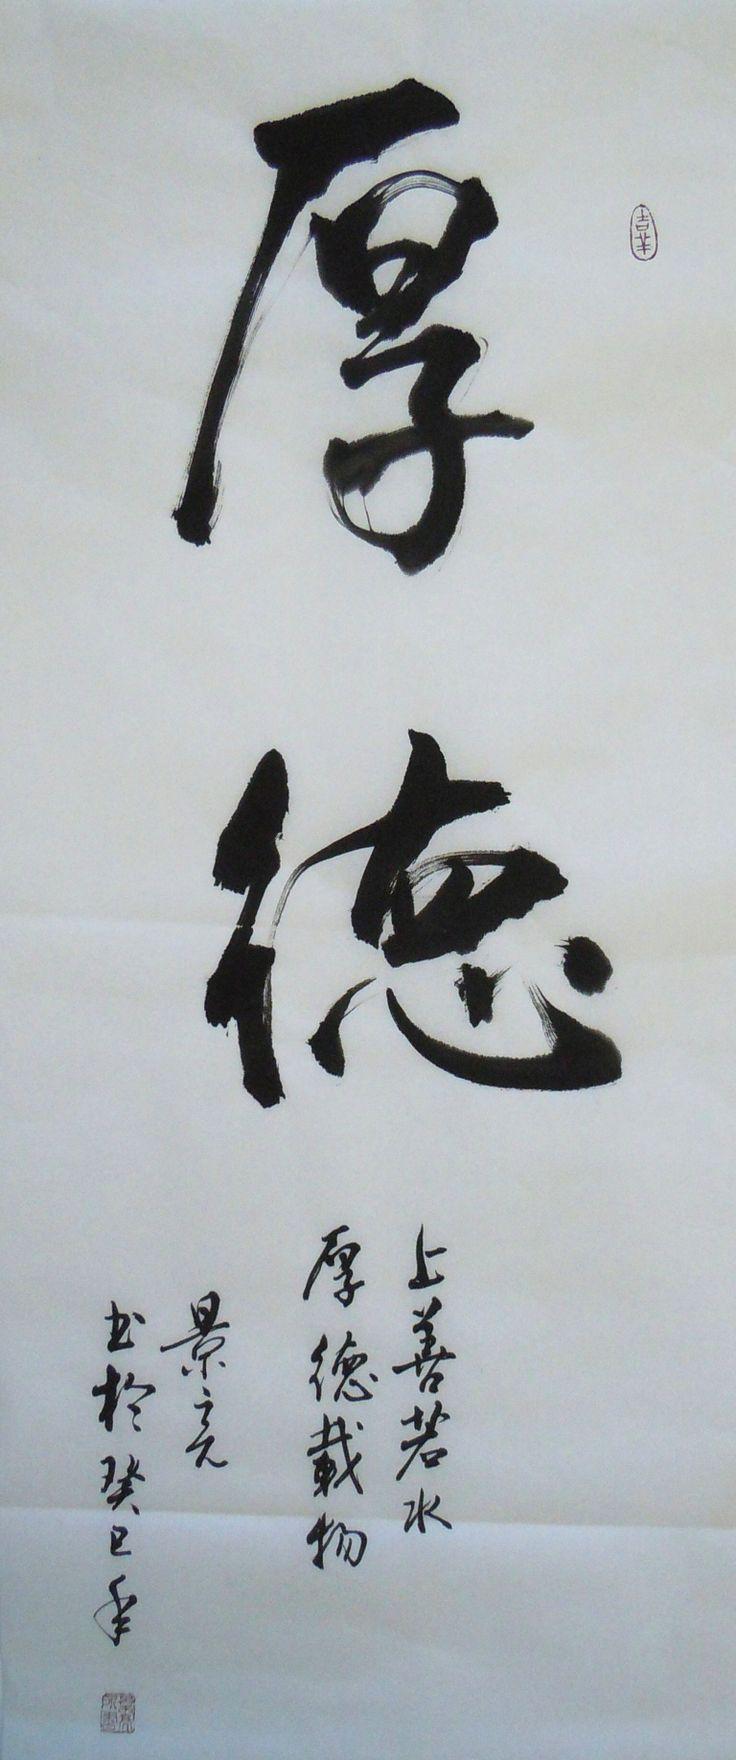 Great virtue brings harmony. 厚德